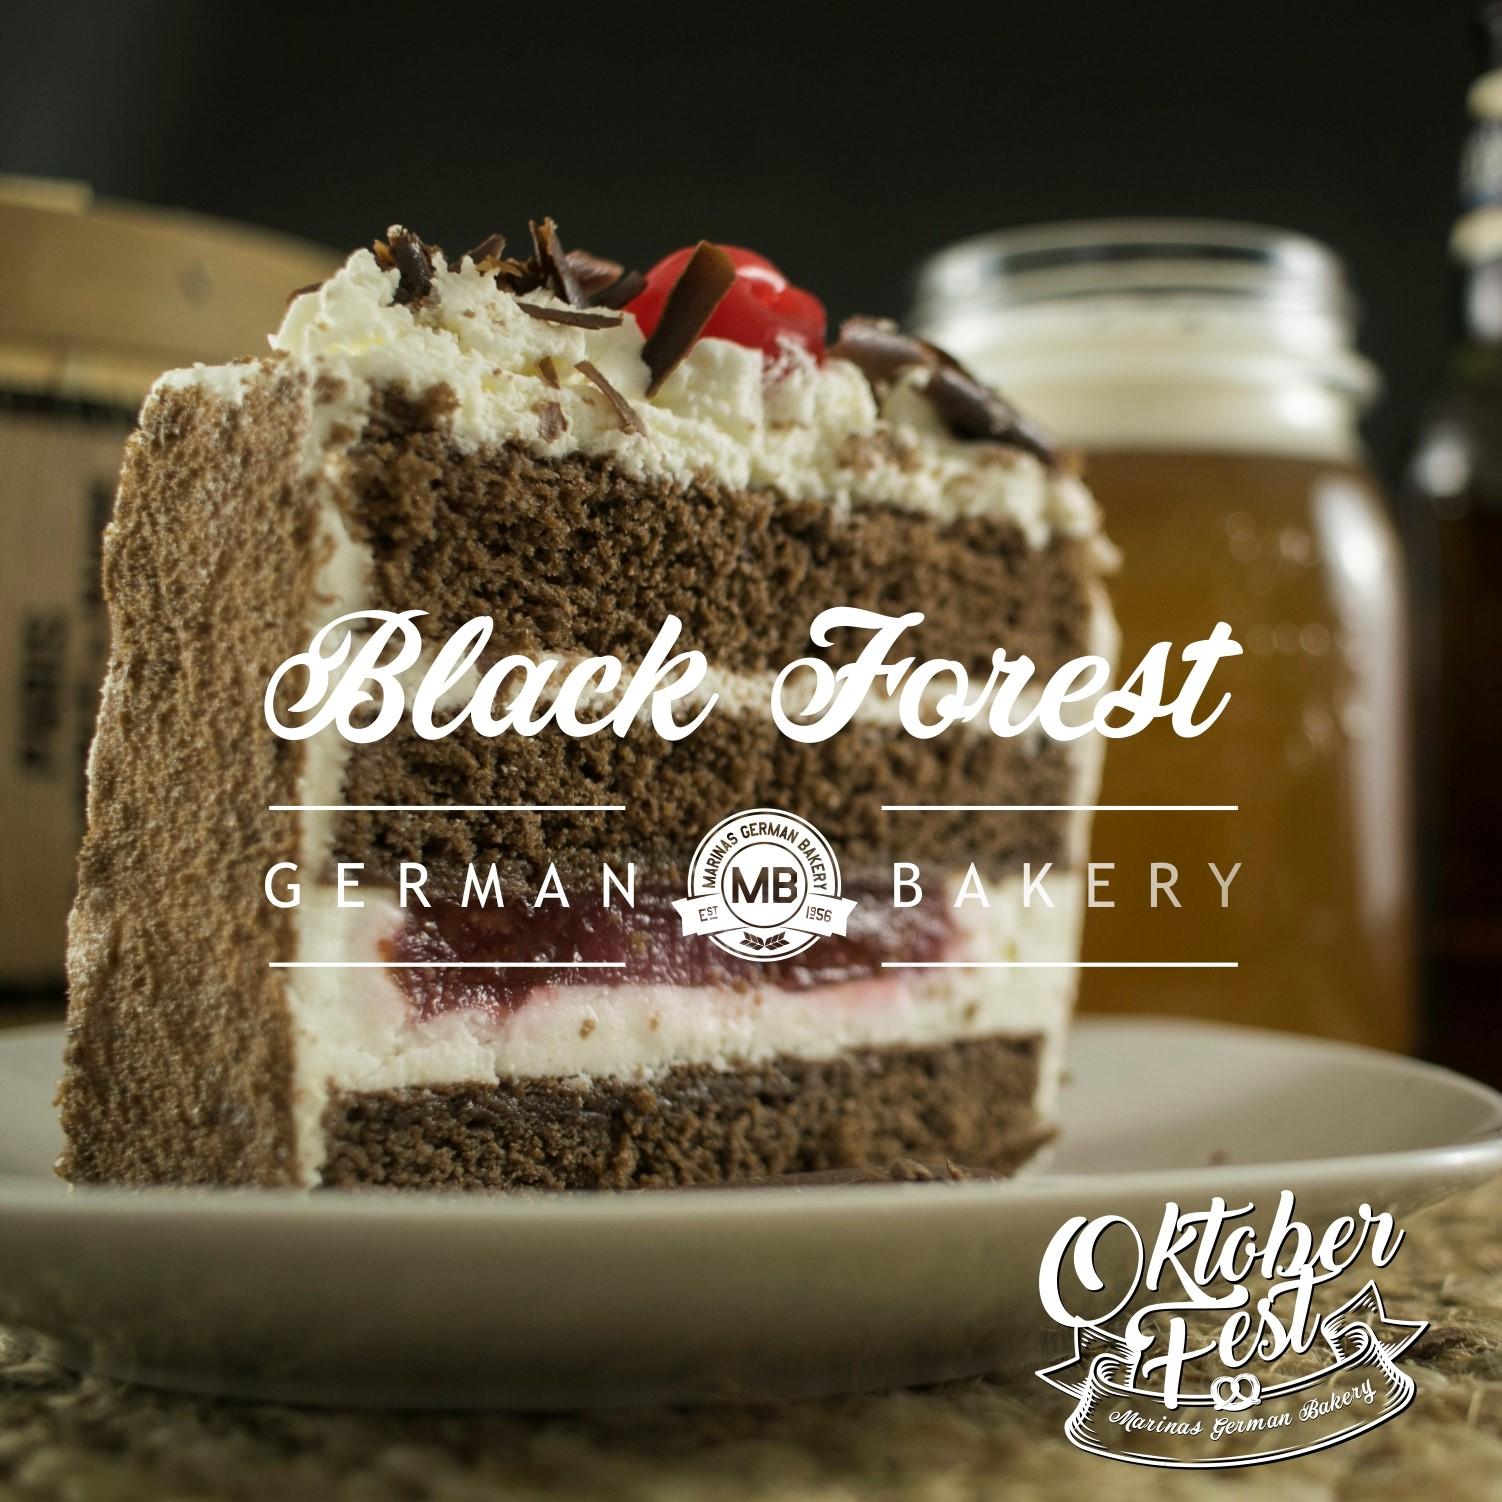 Marina's German Bakery 2033 Trawood Dr, El Paso